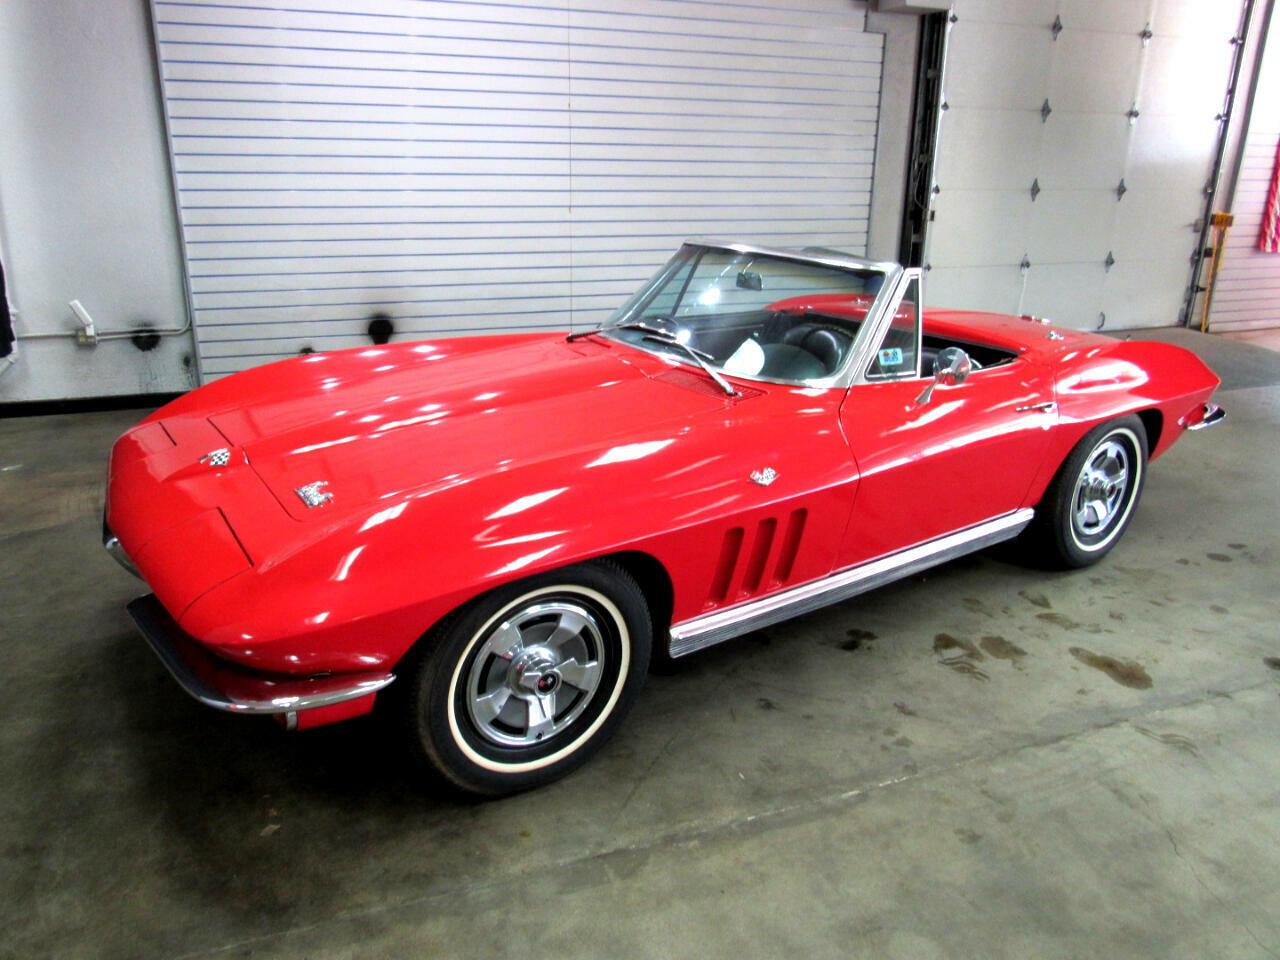 1966 Red Chevrolet Corvette Convertible    C2 Corvette Photo 1